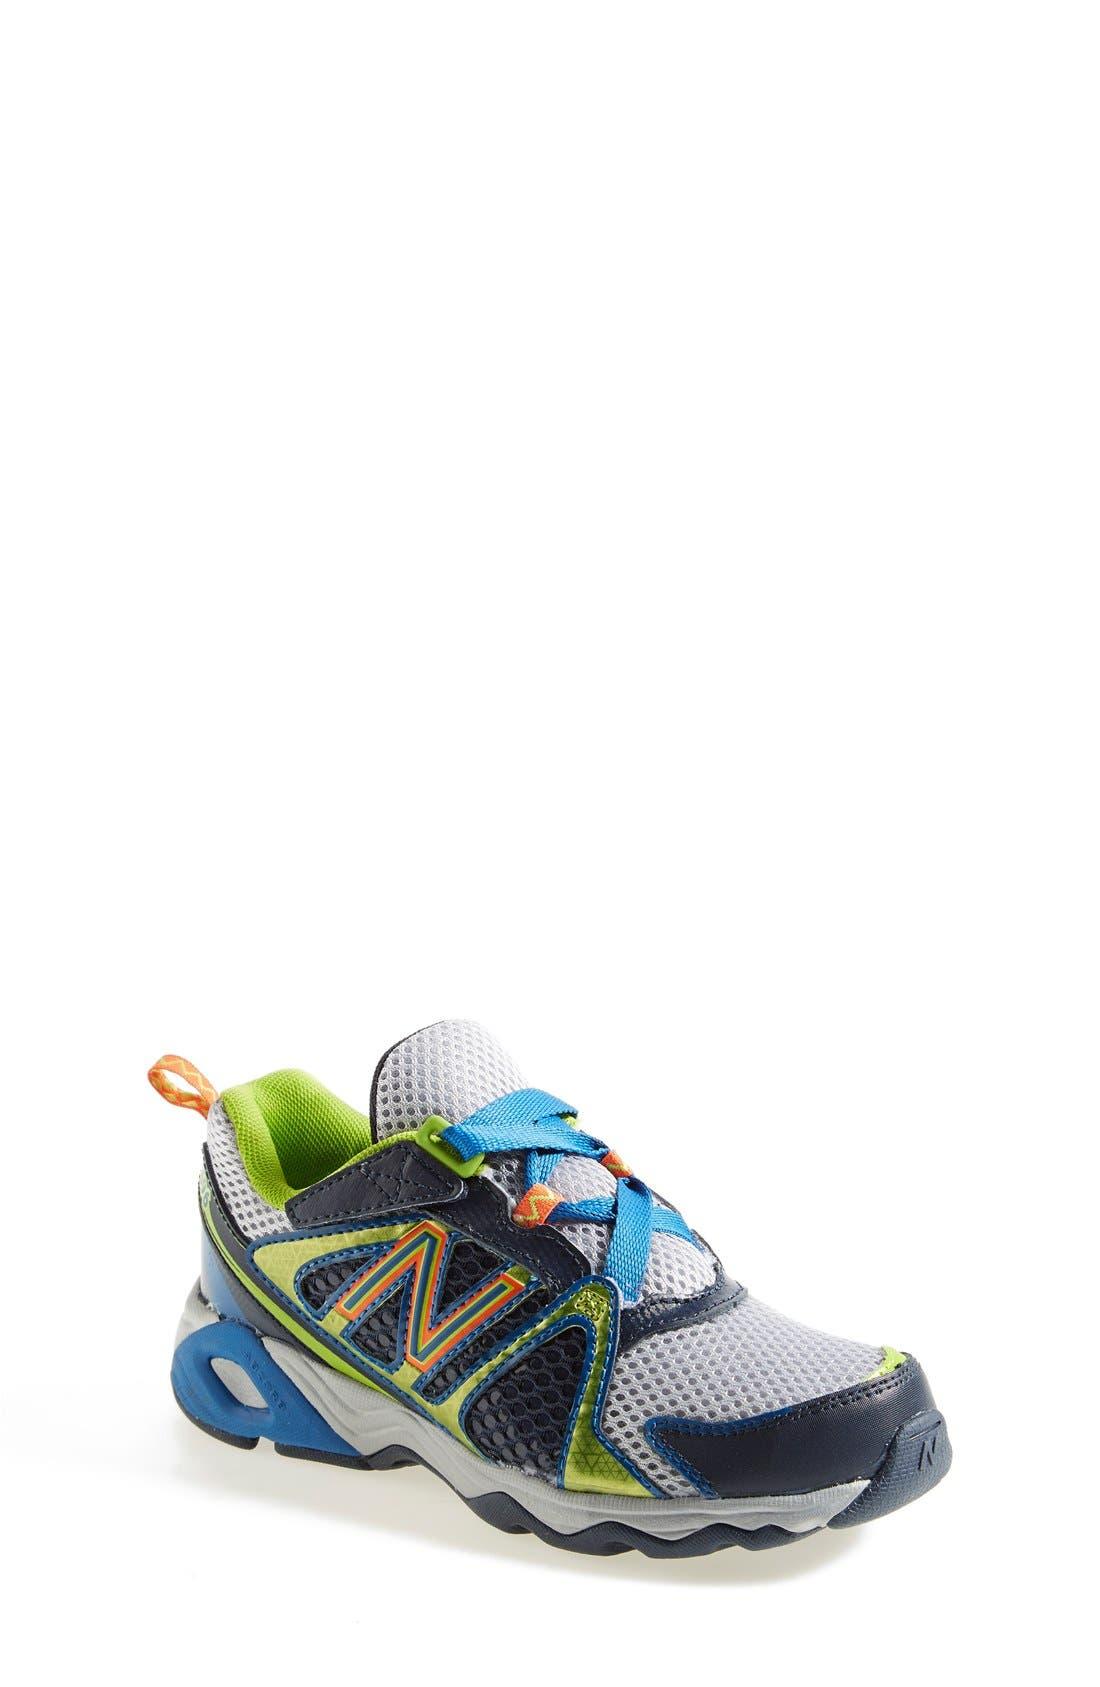 new balance 696 athletic shoe toddler kid big